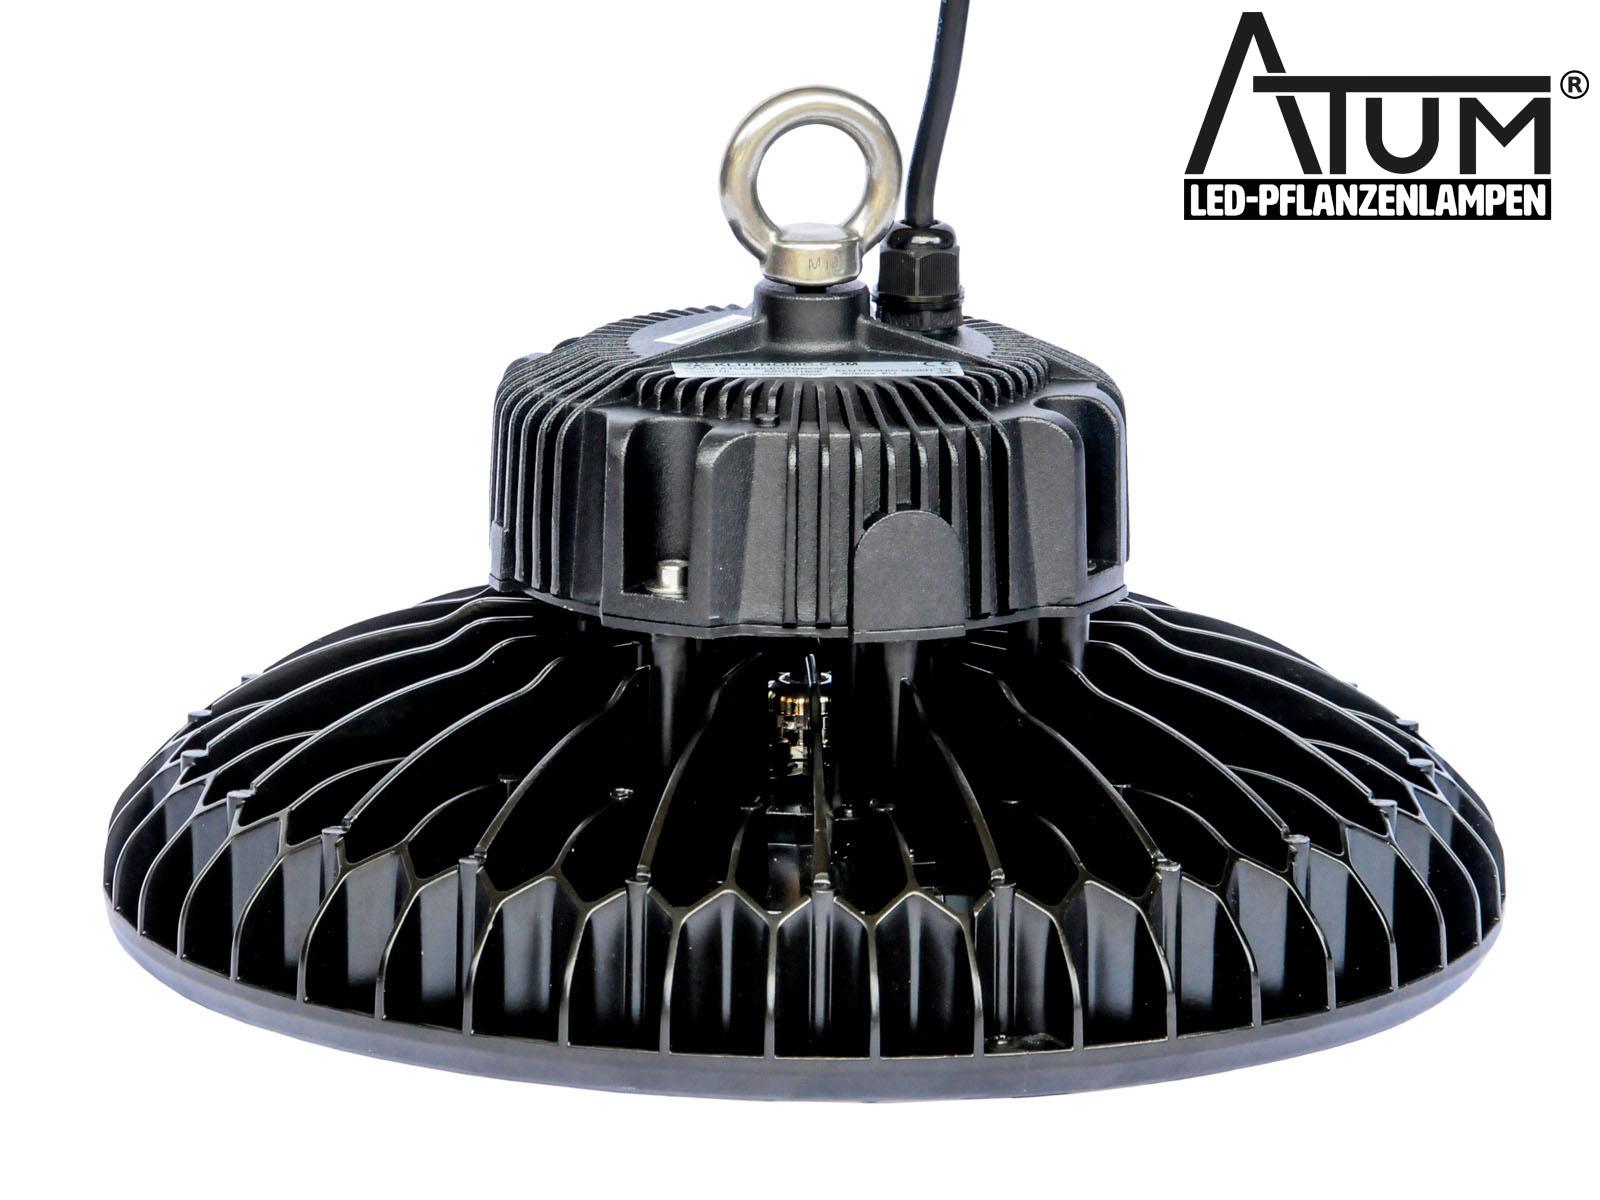 Pflanzenlampe-LED Pflanzenlampe - ATUM SILENT GROW